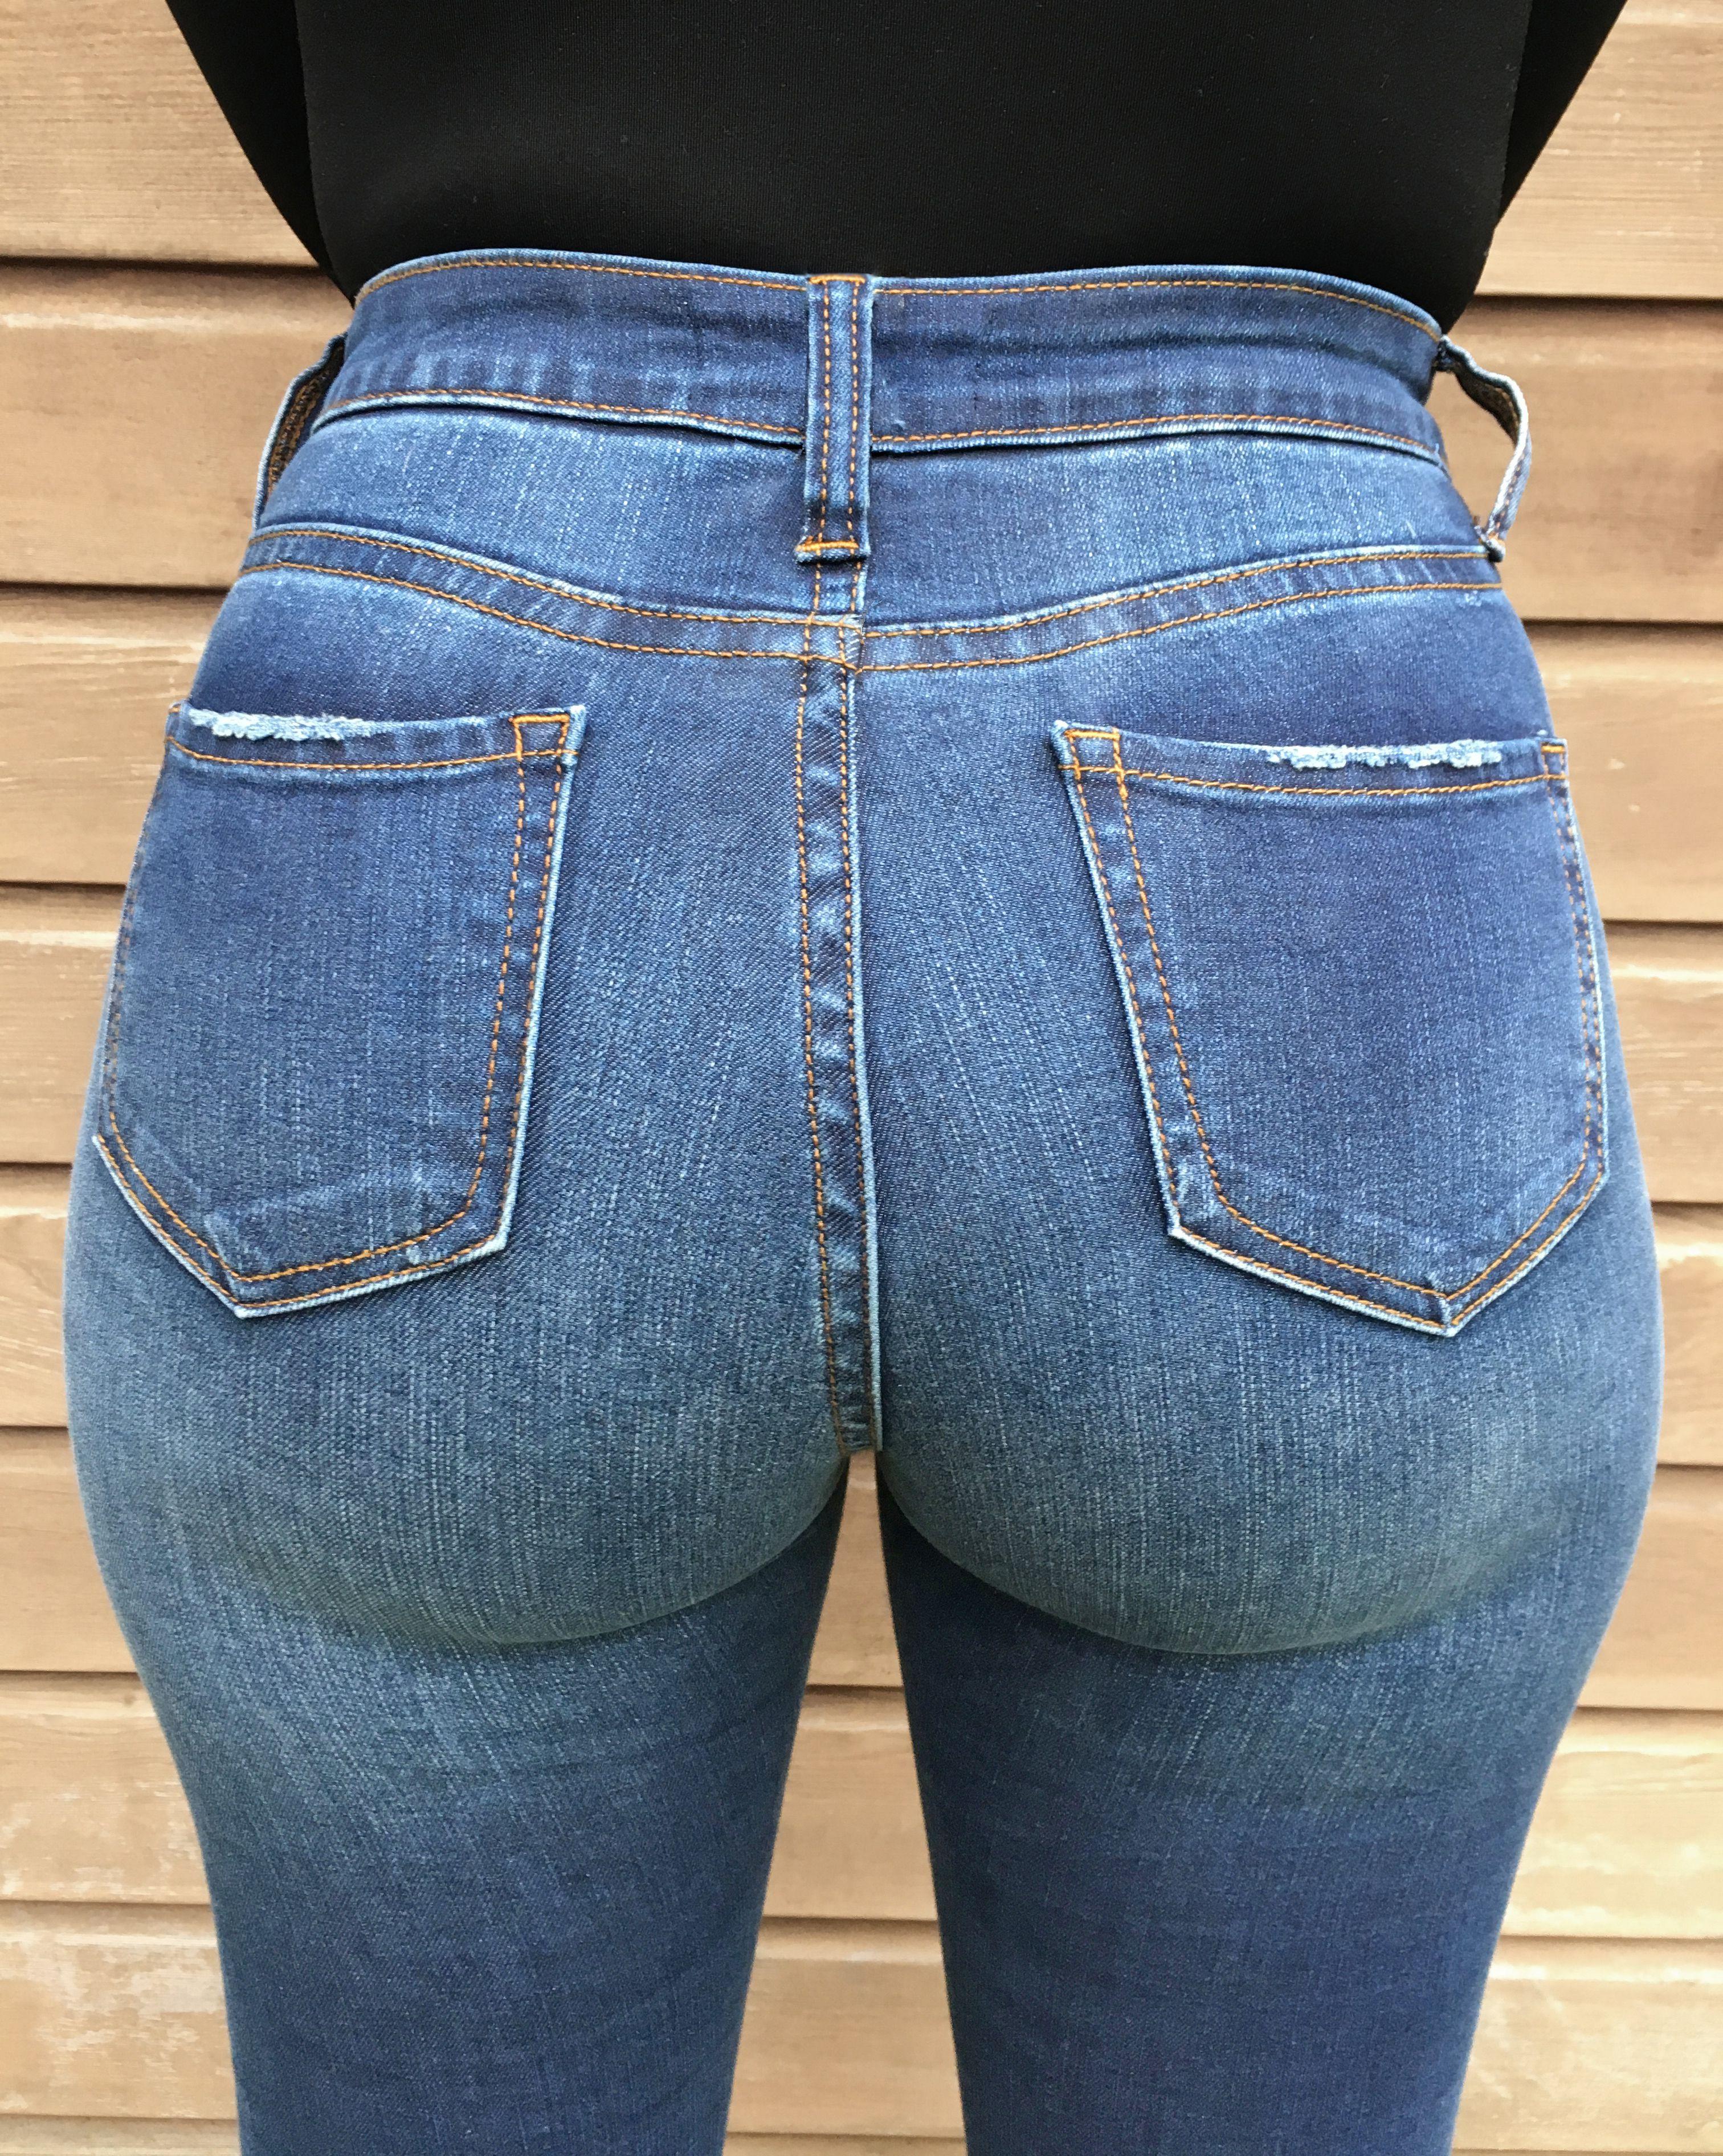 Peach High Elastic Tight Ass Jeans Hips Sports Yoga Pants